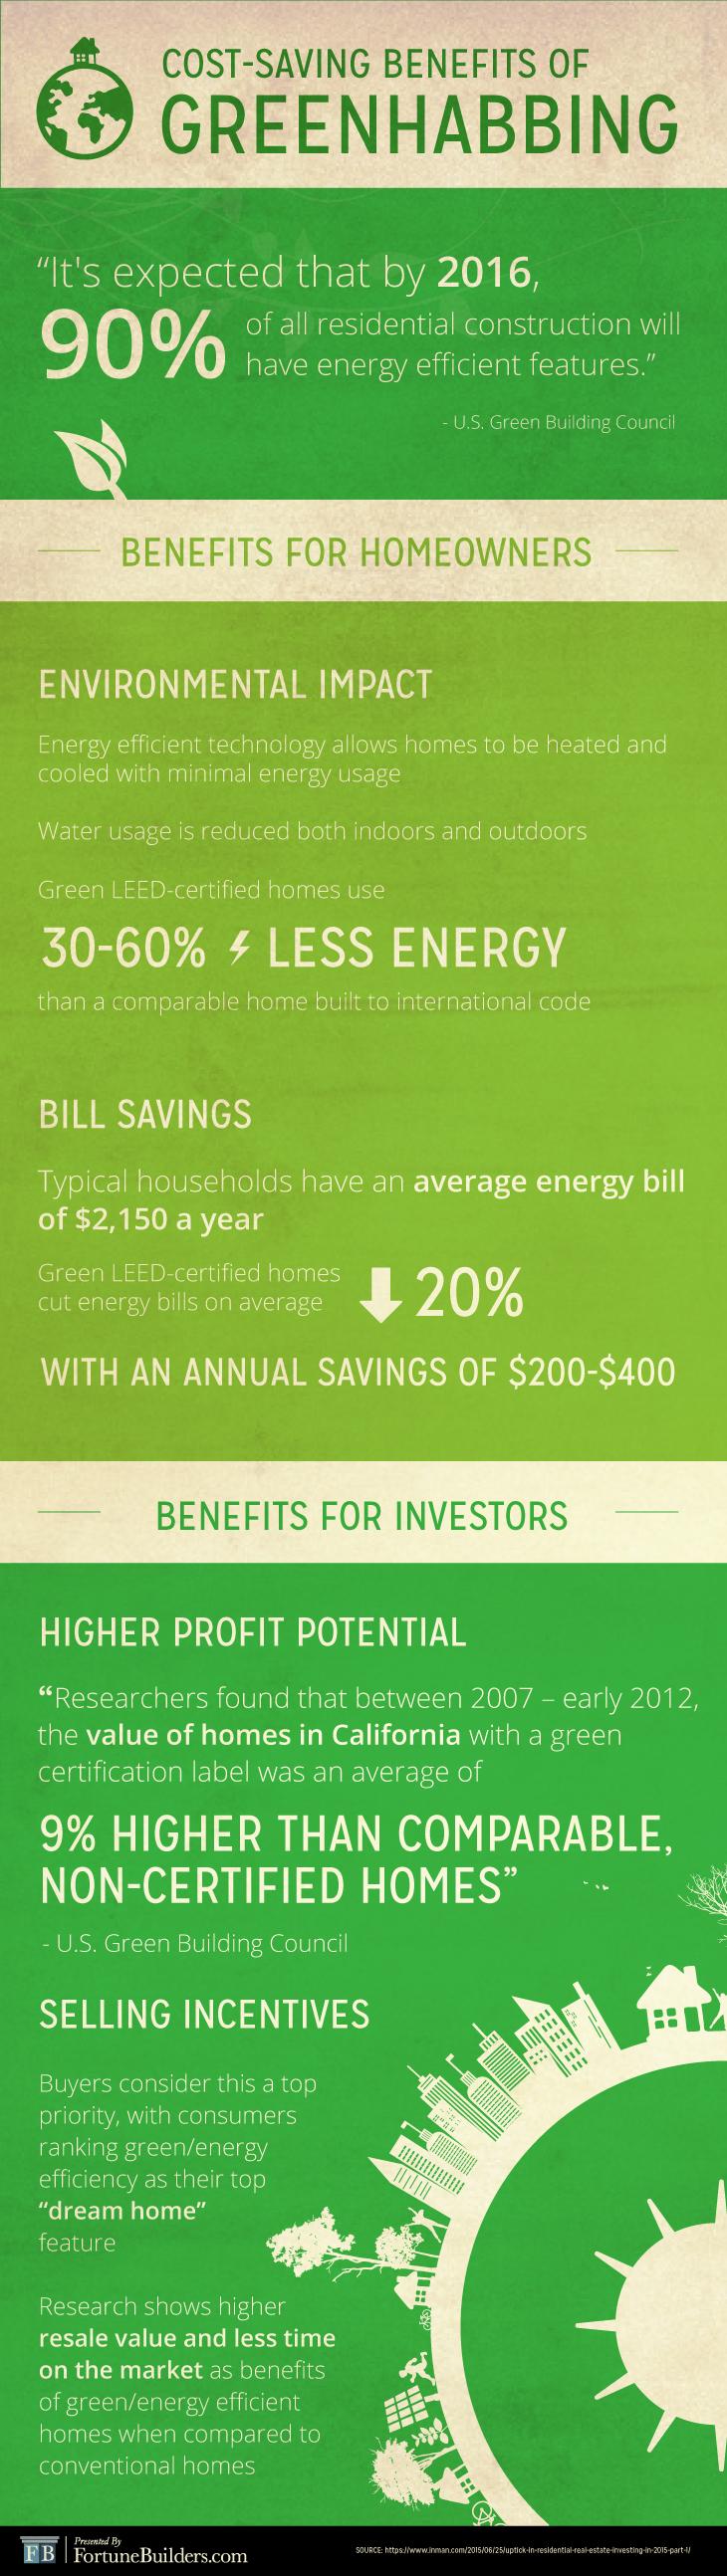 Greenhabbing infographic